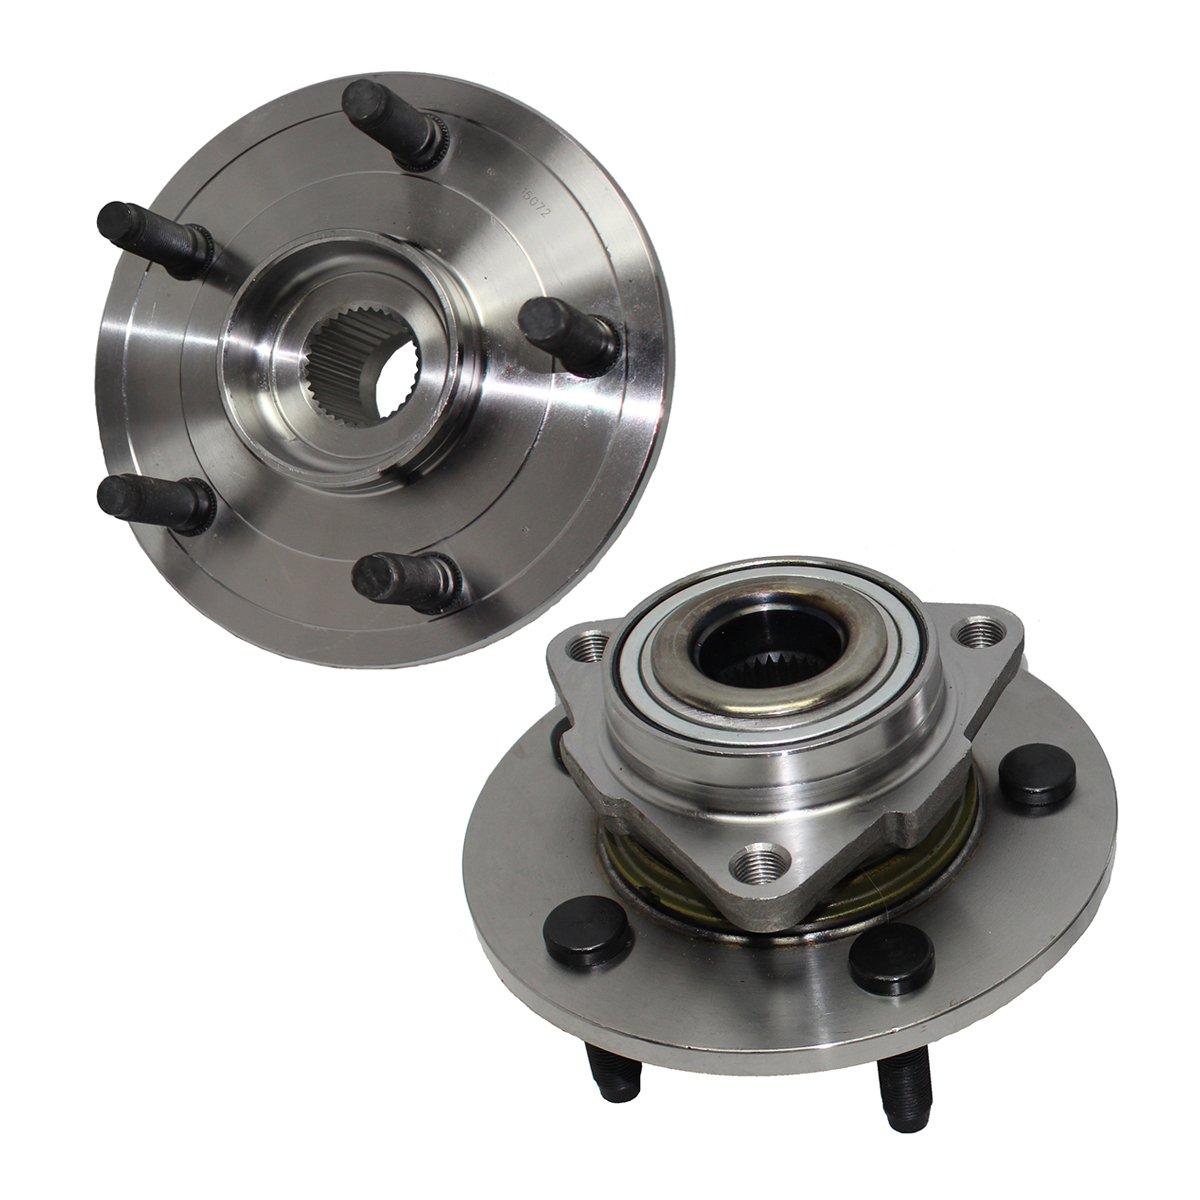 Detroit Axle - Brand New Pair Front Wheel Hub and Bearing Assemblies, NO ABS on HUB fits [2002-2008 Dodge Ram 1500 No ABS on Hub 5-Lug]